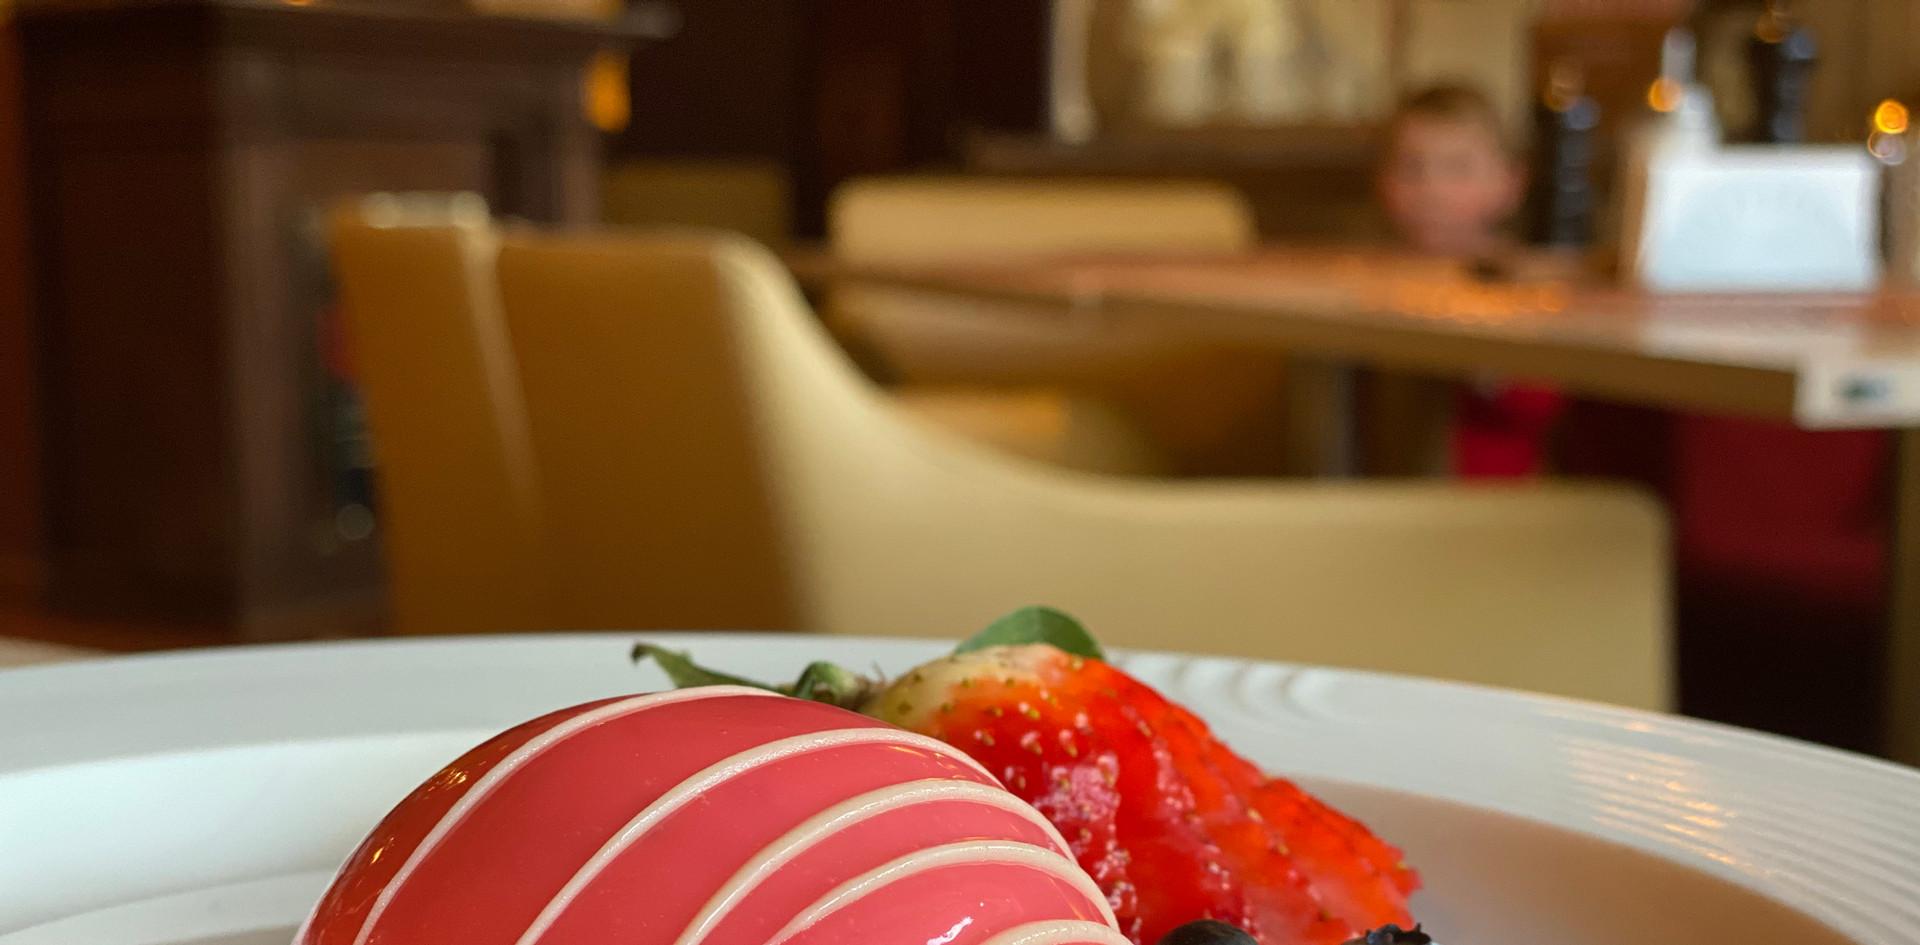 selbstgemachtes Törtchen Lunch & Sweet - Hotel Wegner - The culinary Art Hotel